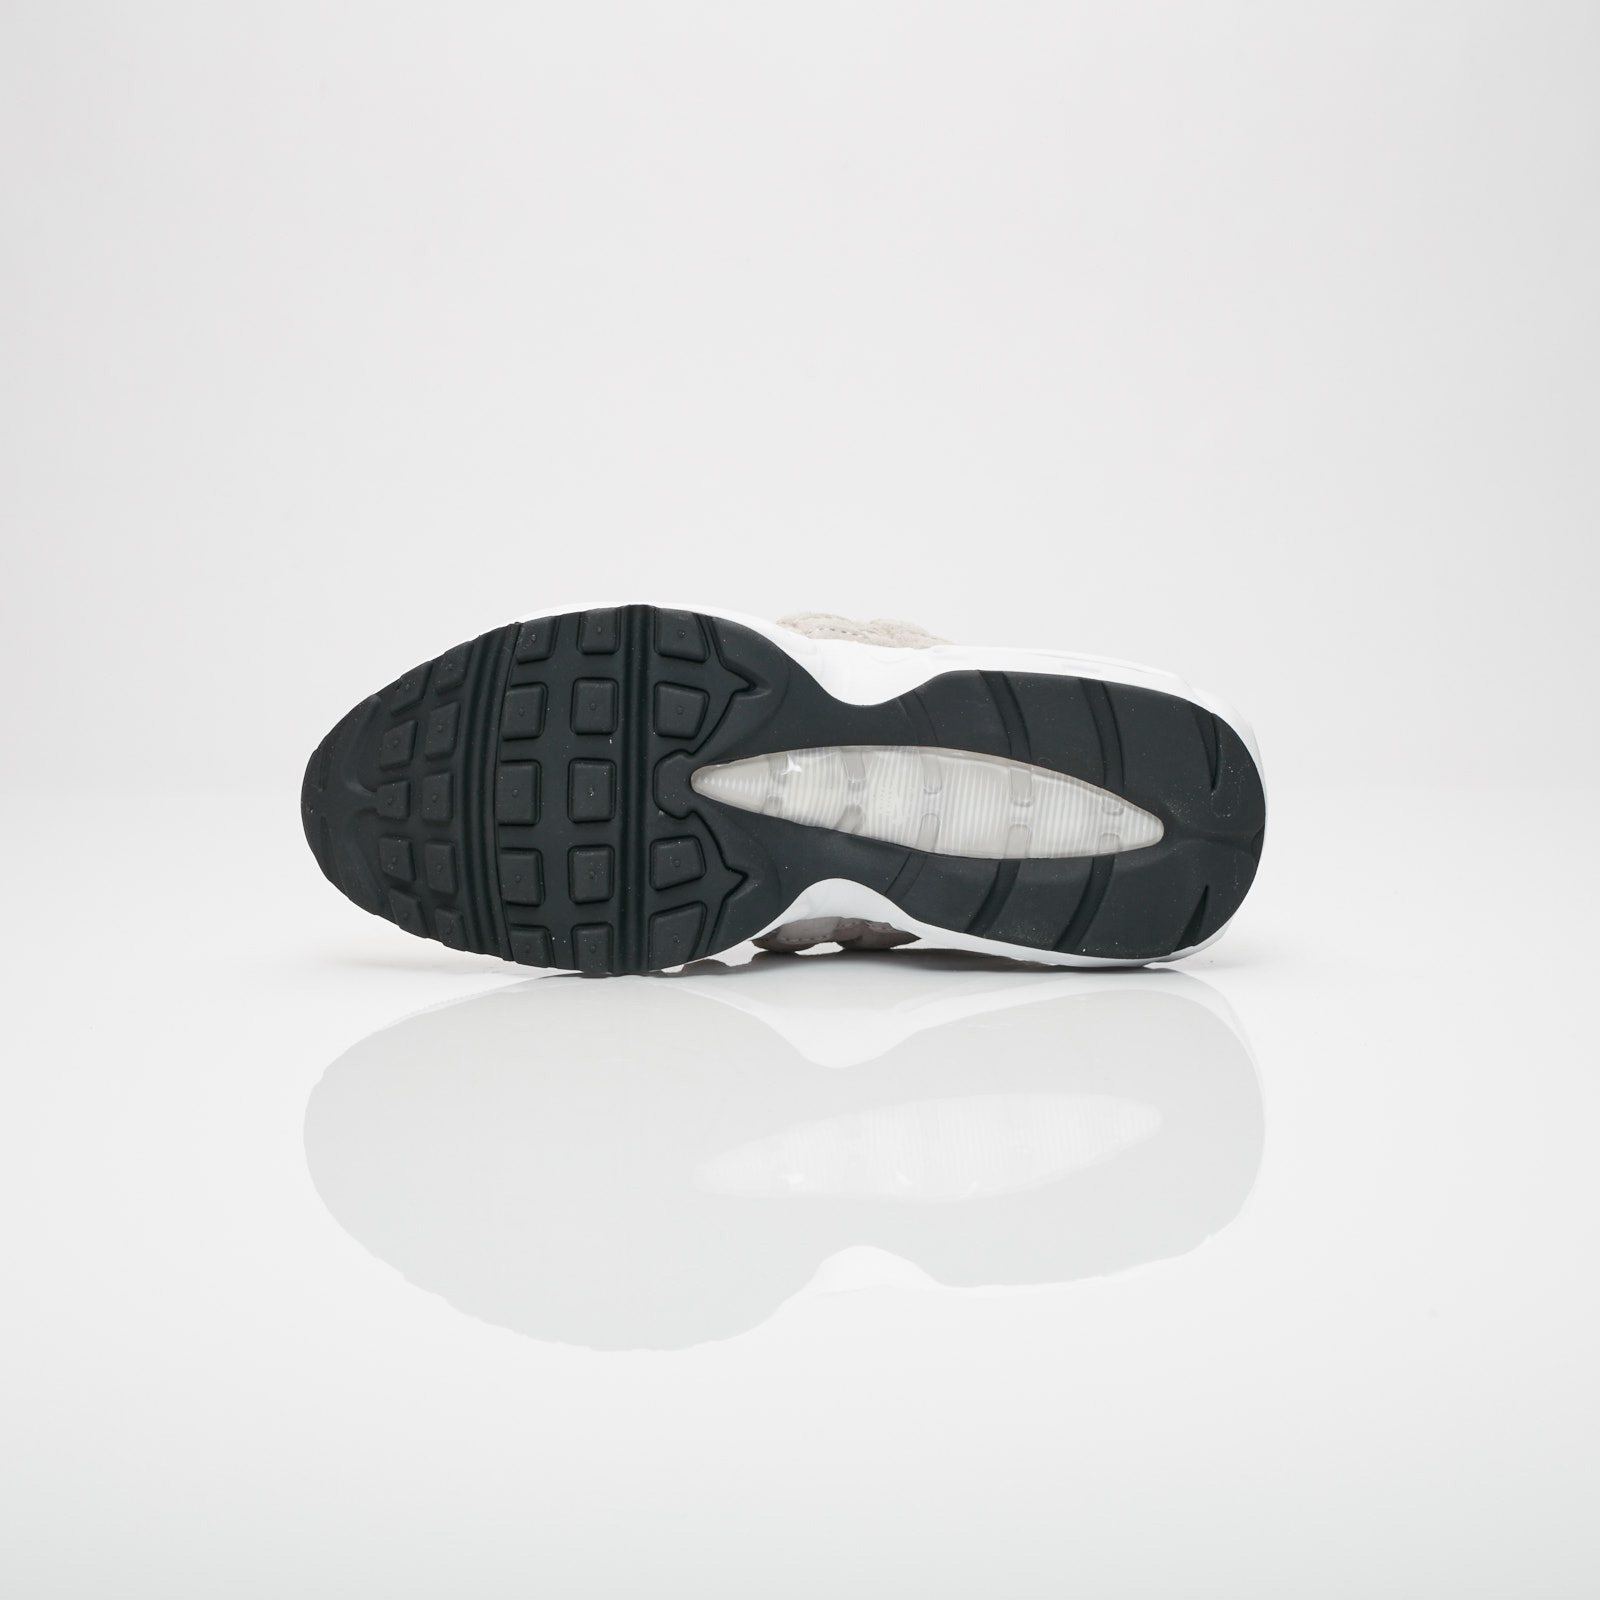 size 40 61937 dcb5e Nike Sportswear Wmns Air Max 95 PRM - 6. Stäng